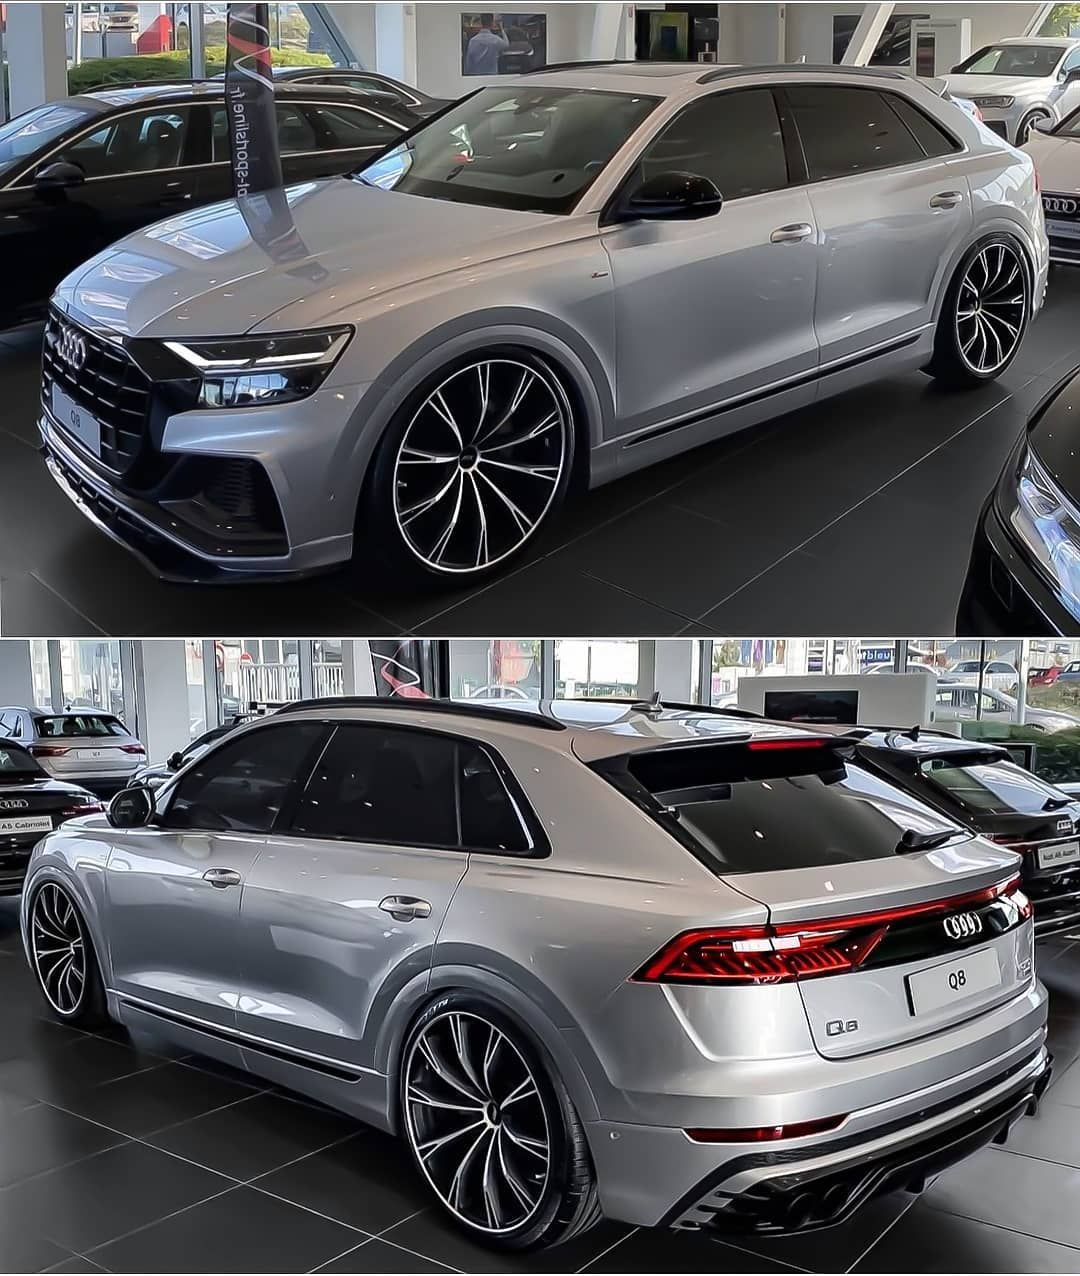 6 987 Vpodoban 29 Komentariv Audi Q8 Q8 Nation V Instagram The Silver Abt Tank In The Showroom Audi Rs Luxury Cars Bmw